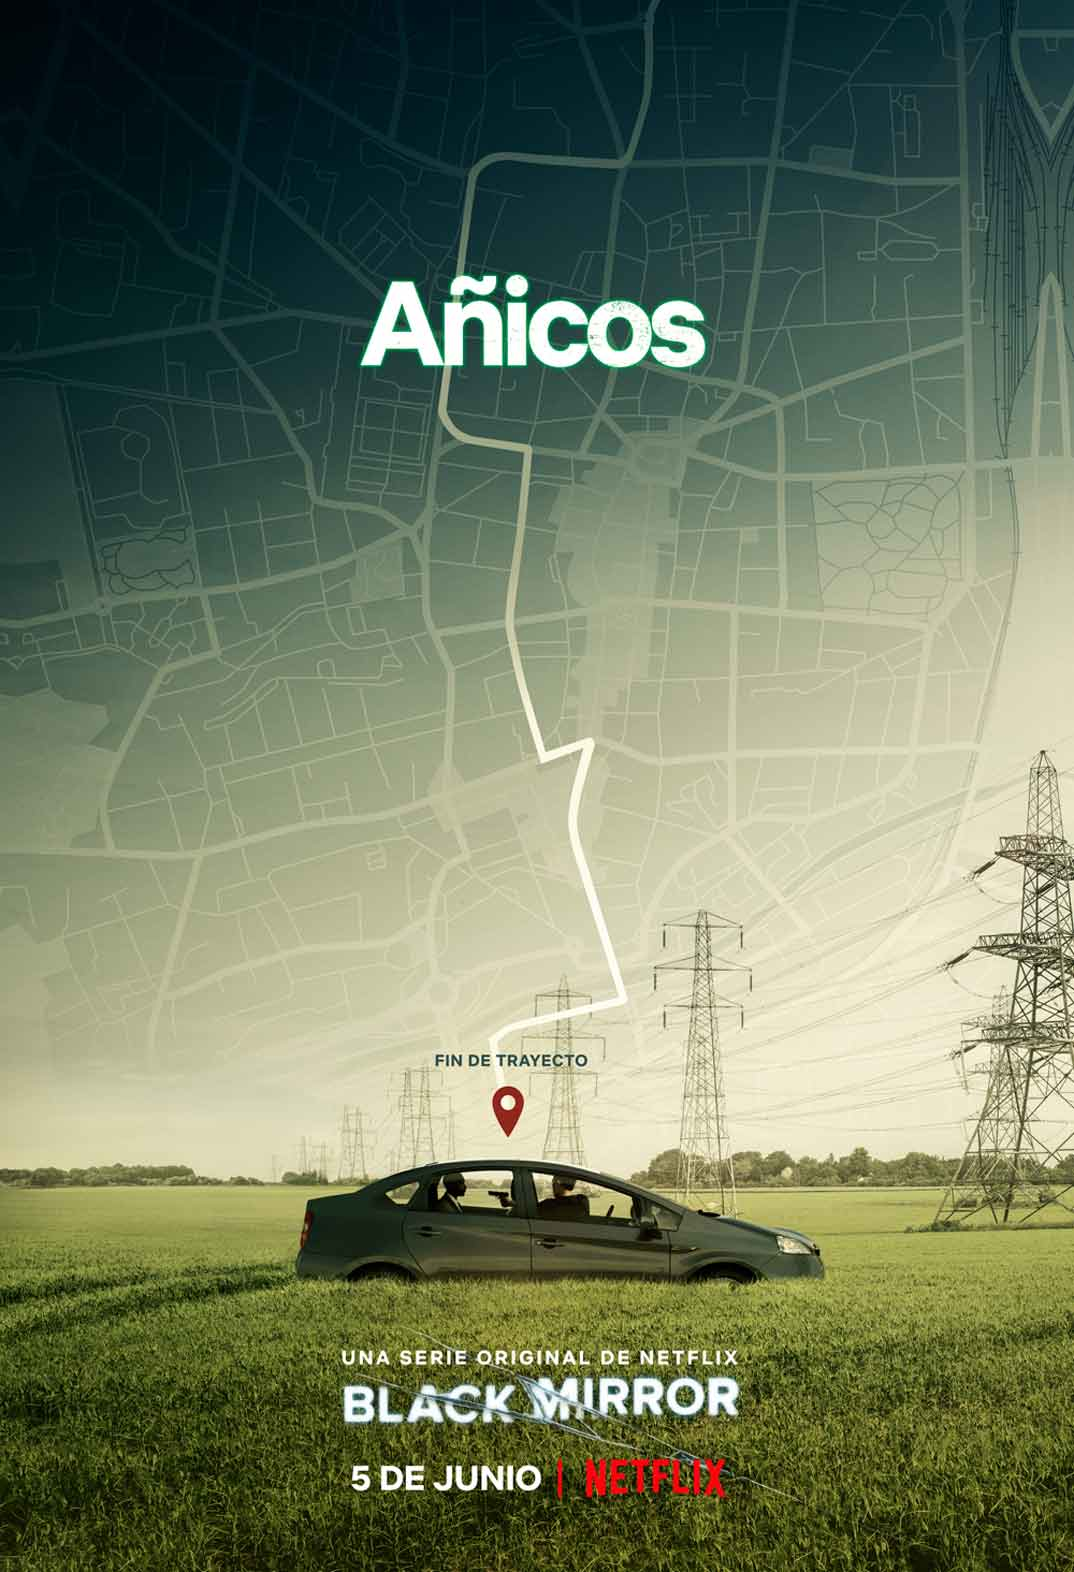 Añicos - Black Mirror © Netflix